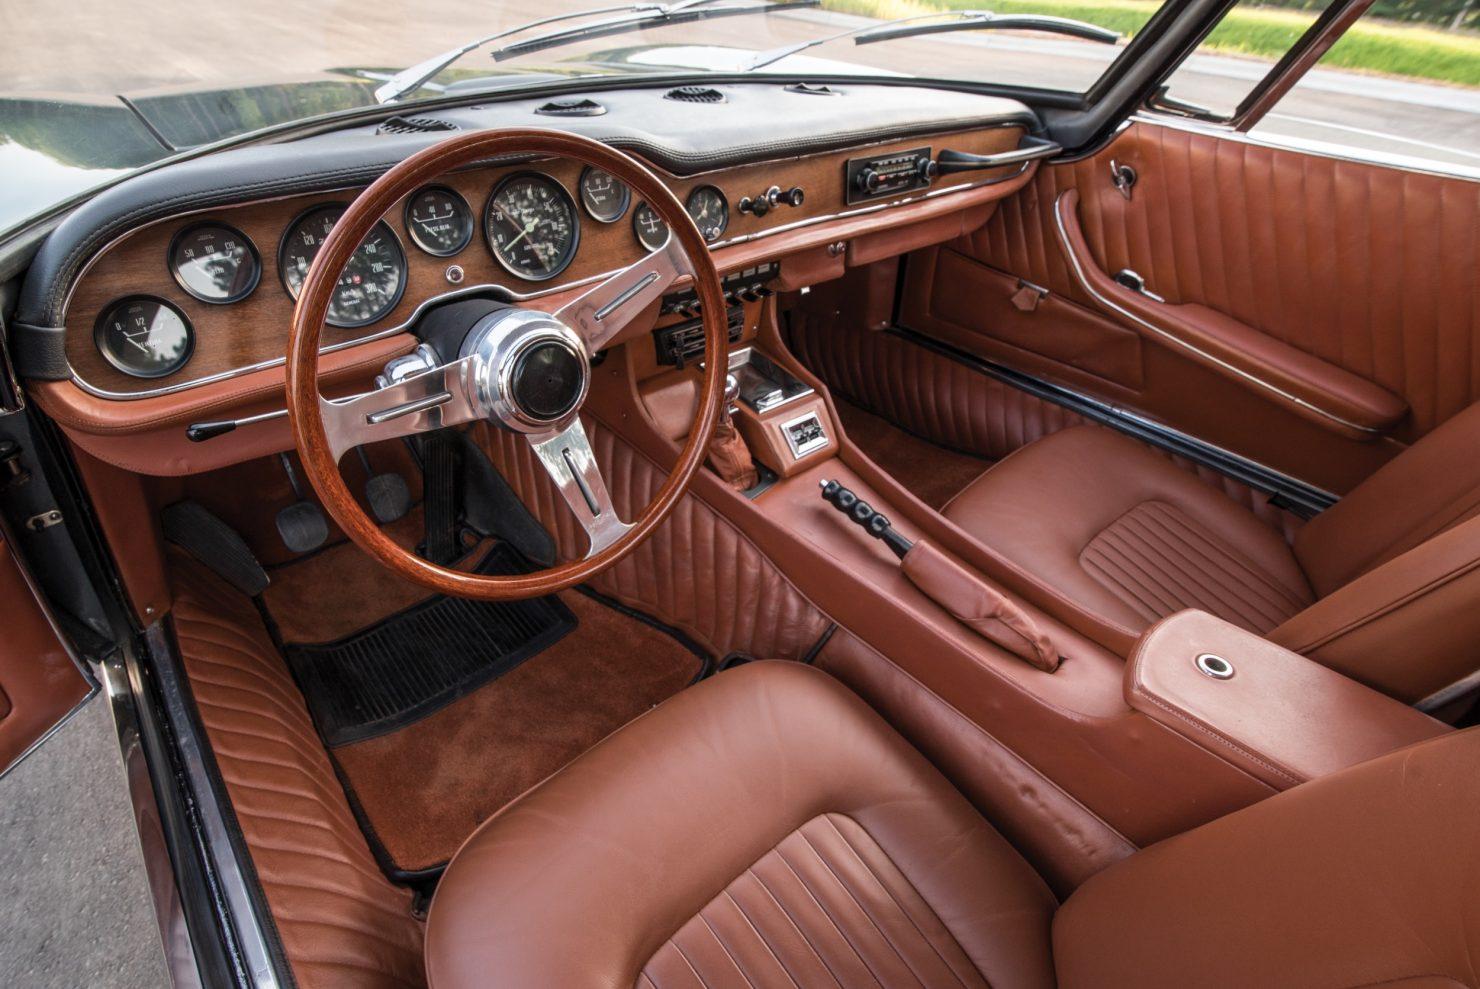 iso grifo car 4 1480x989 - 1966 Iso Grifo GL Series I